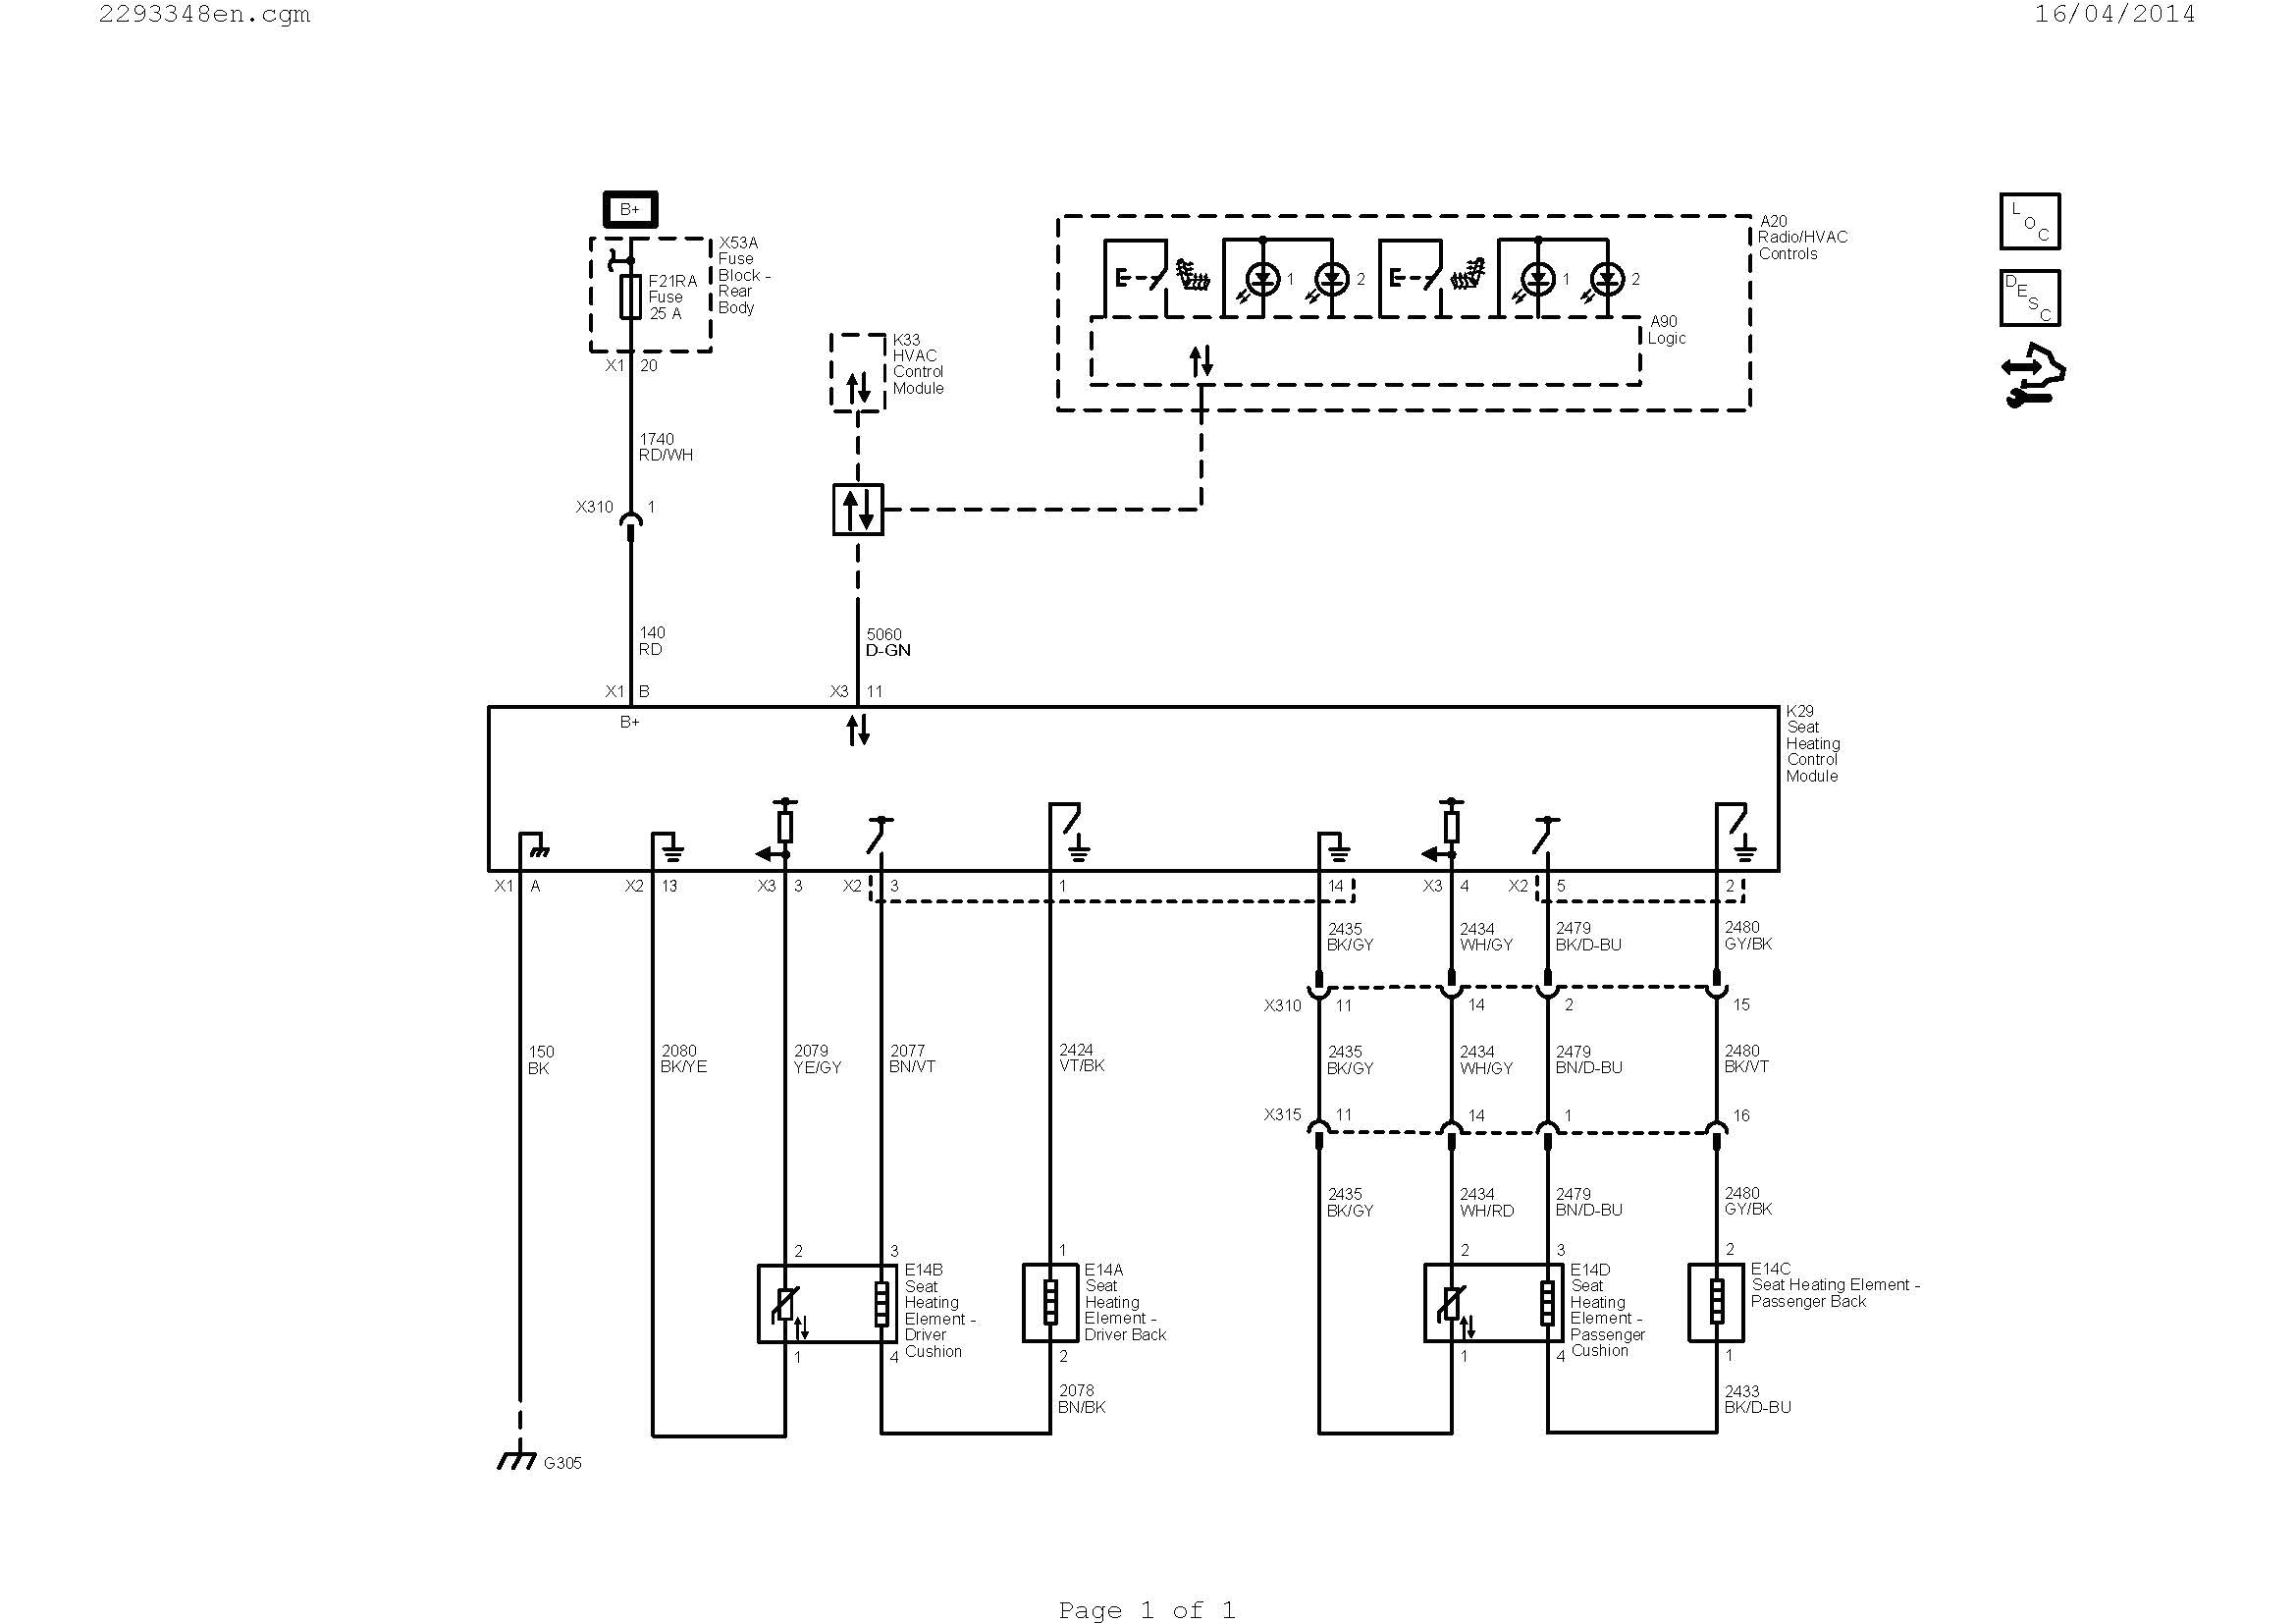 Wifi Wiring Diagram Wiring A Rv Park Wiring Diagrams Lol